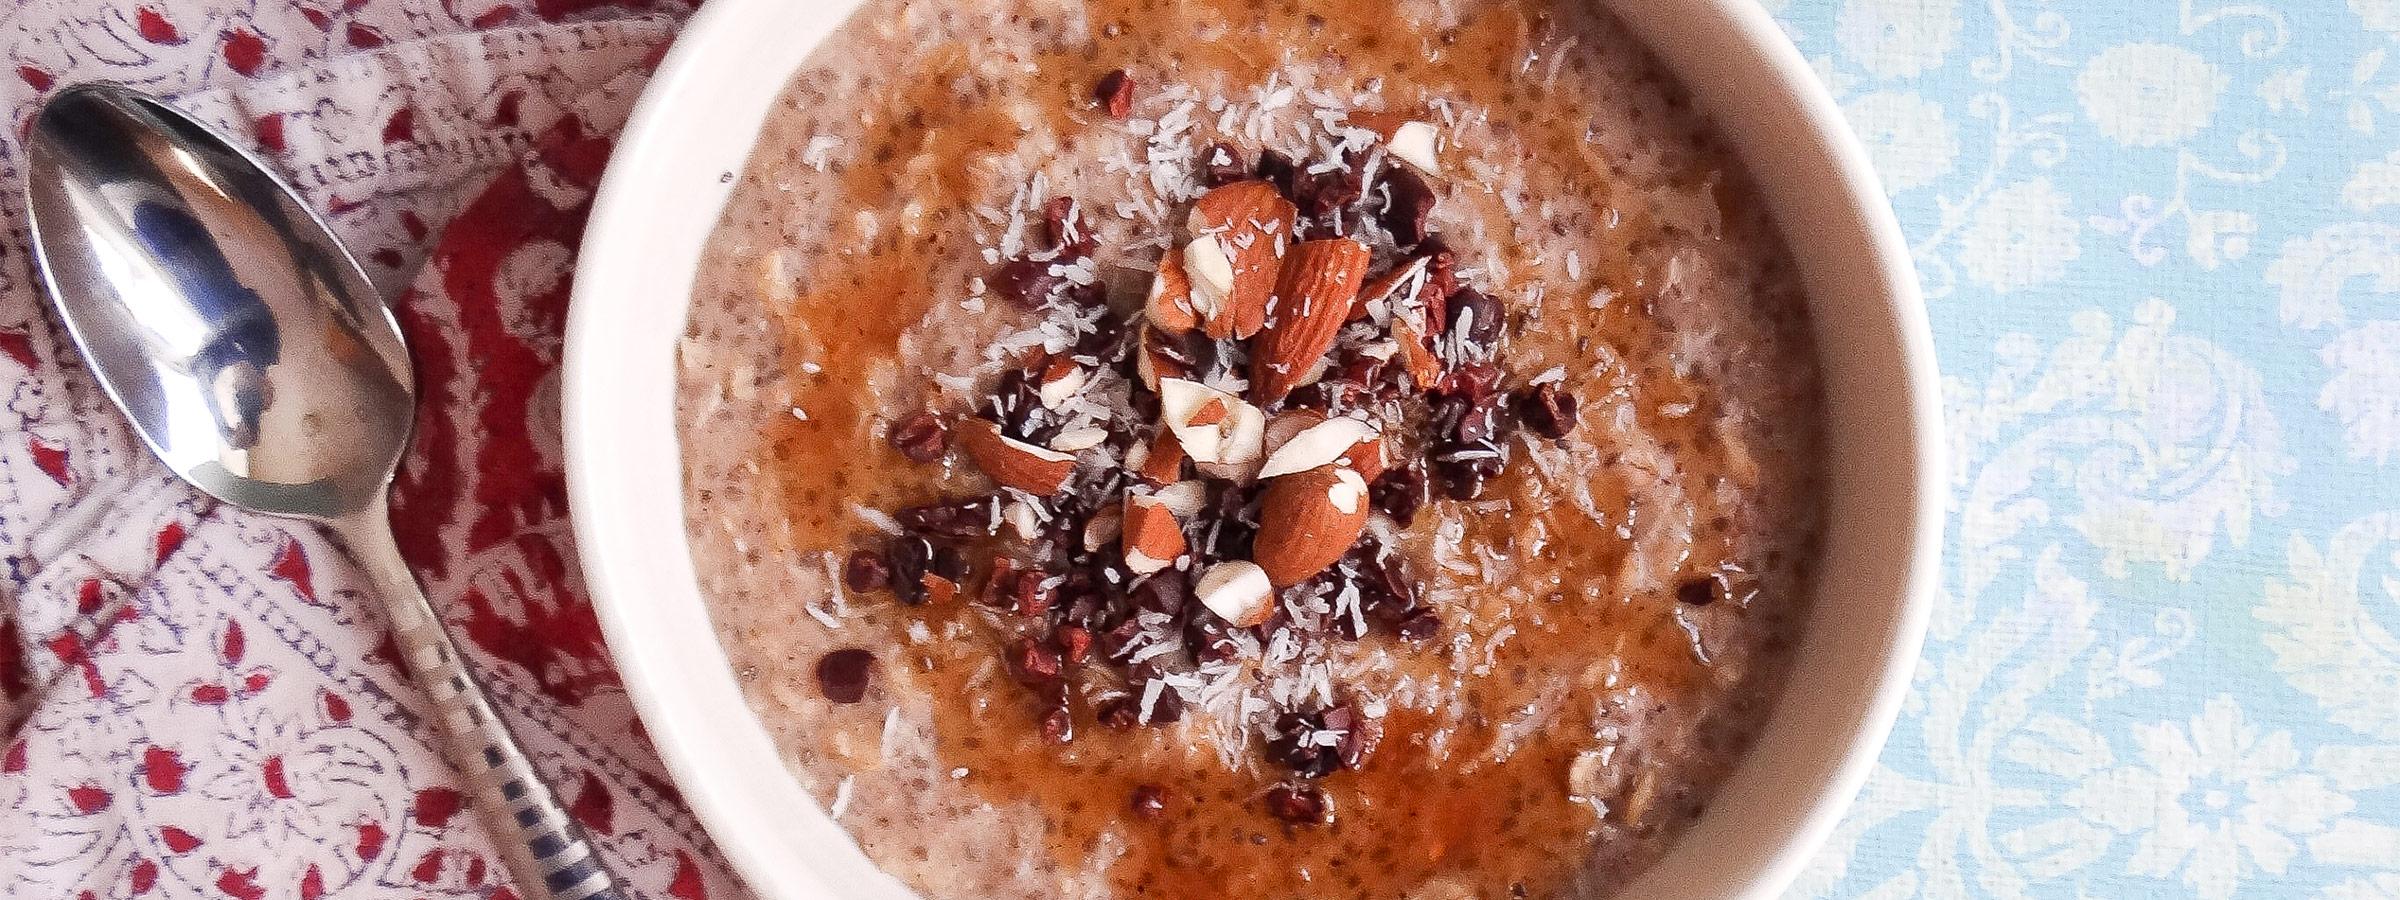 coconut cacao nib oatmeal hero